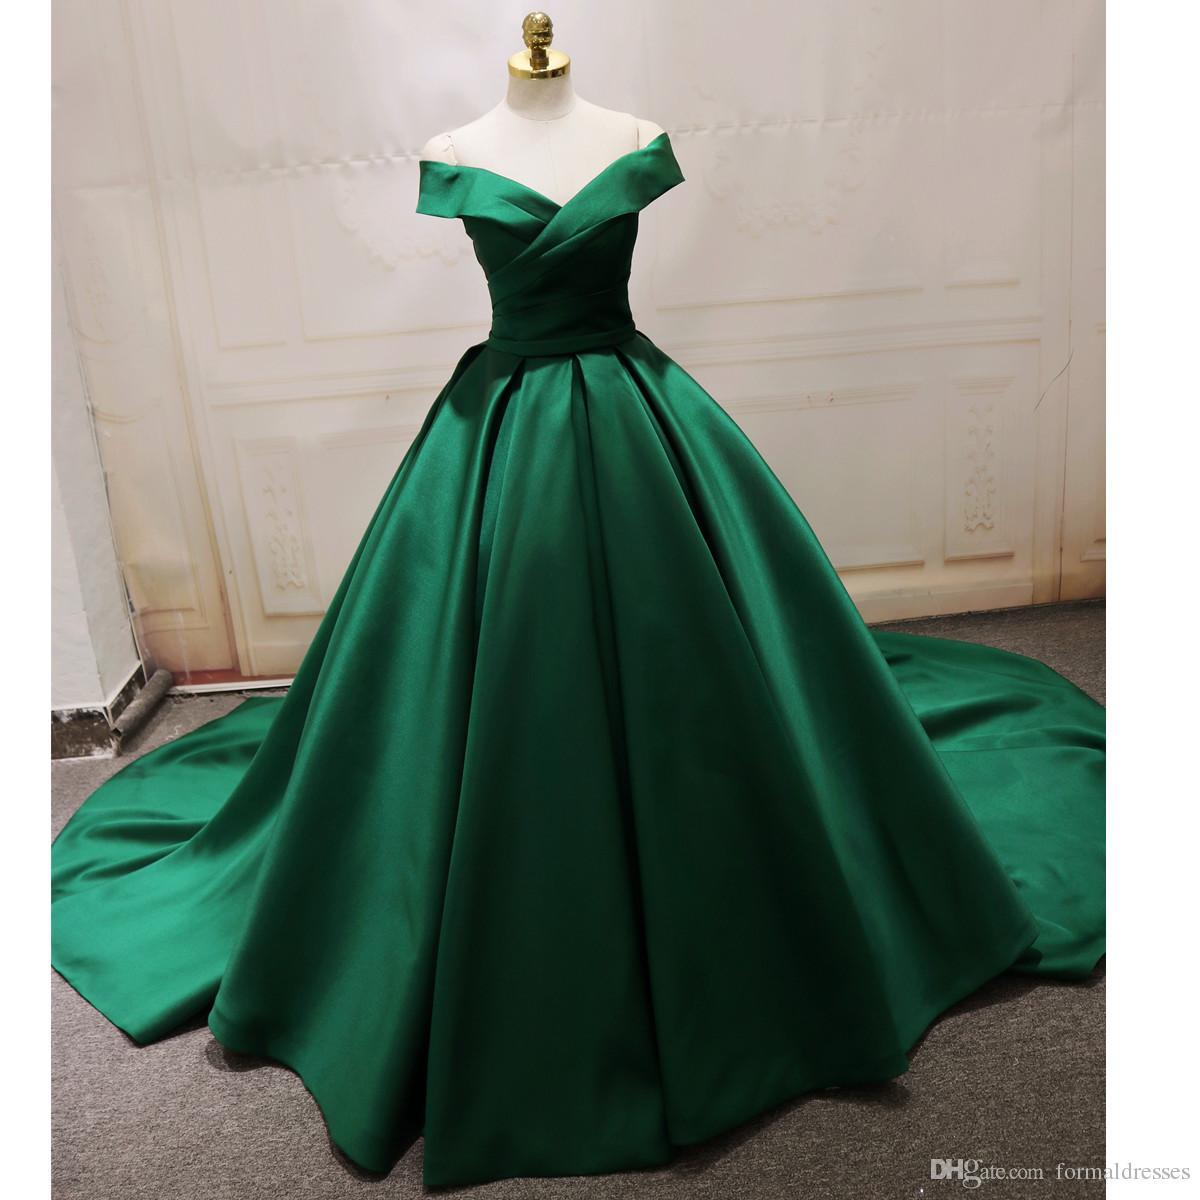 Green Ball Gown Quinceanera Dress Cap Sleeve Corsetto Satin Sweep Train Sweet 16 Abiti Evening Pageant Vestido De 15 Anos Homecoming Wear